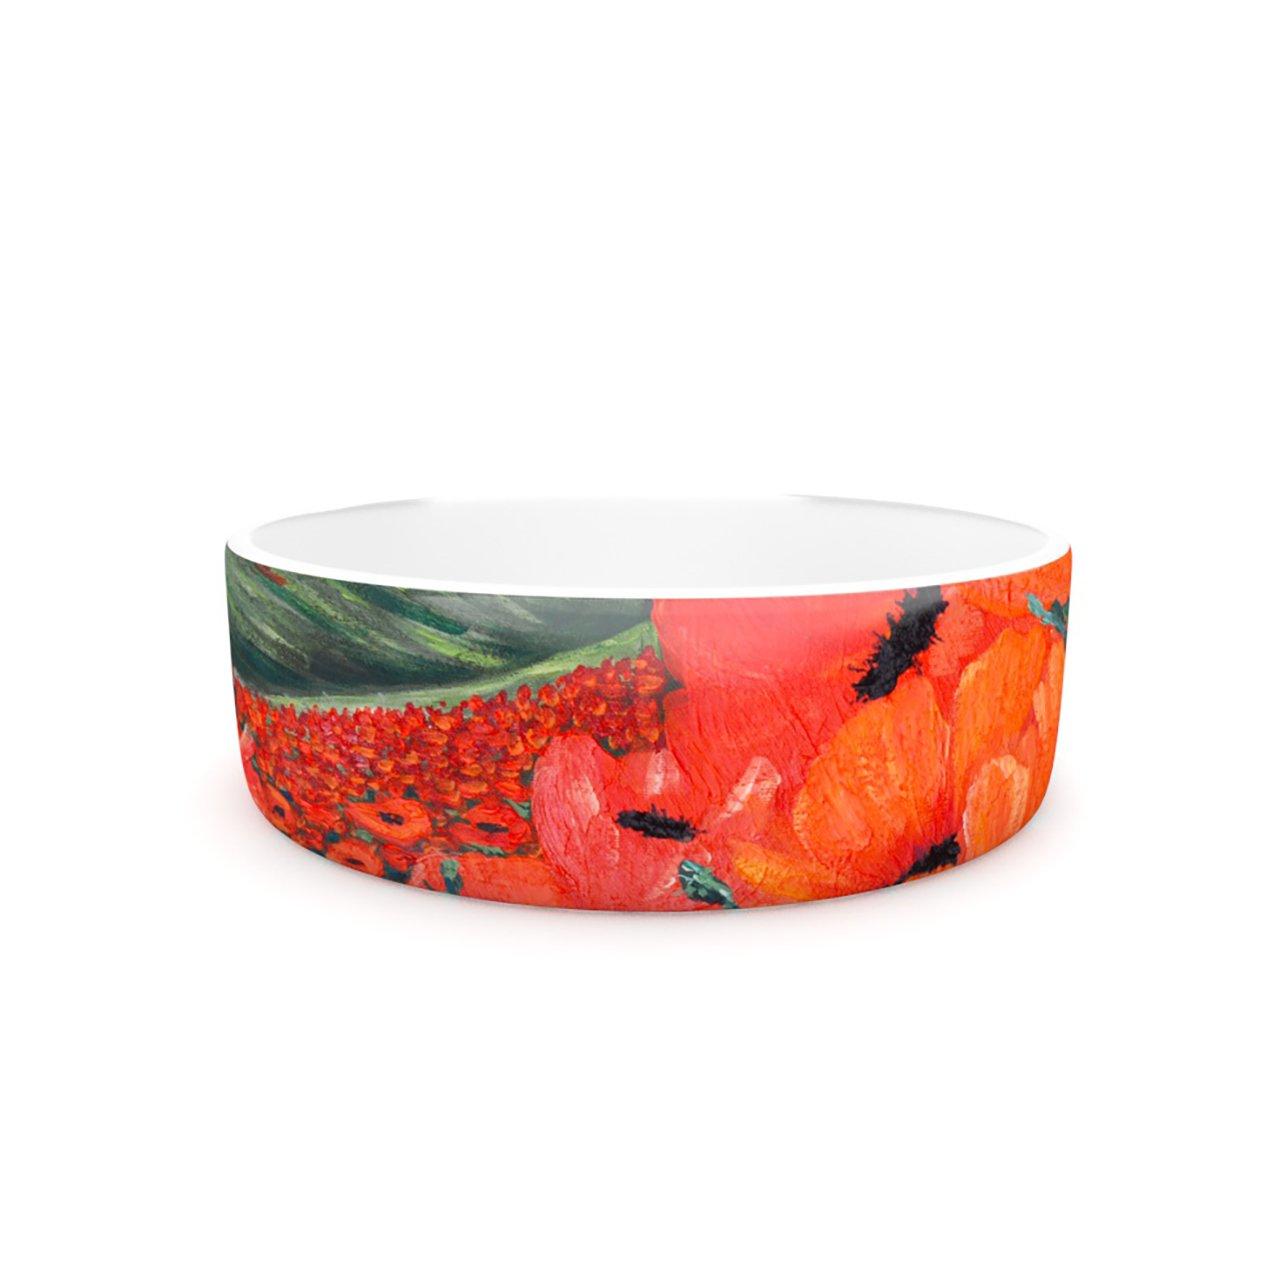 Kess InHouse Christen Treat Poppies  Pet Bowl, 7-Inch